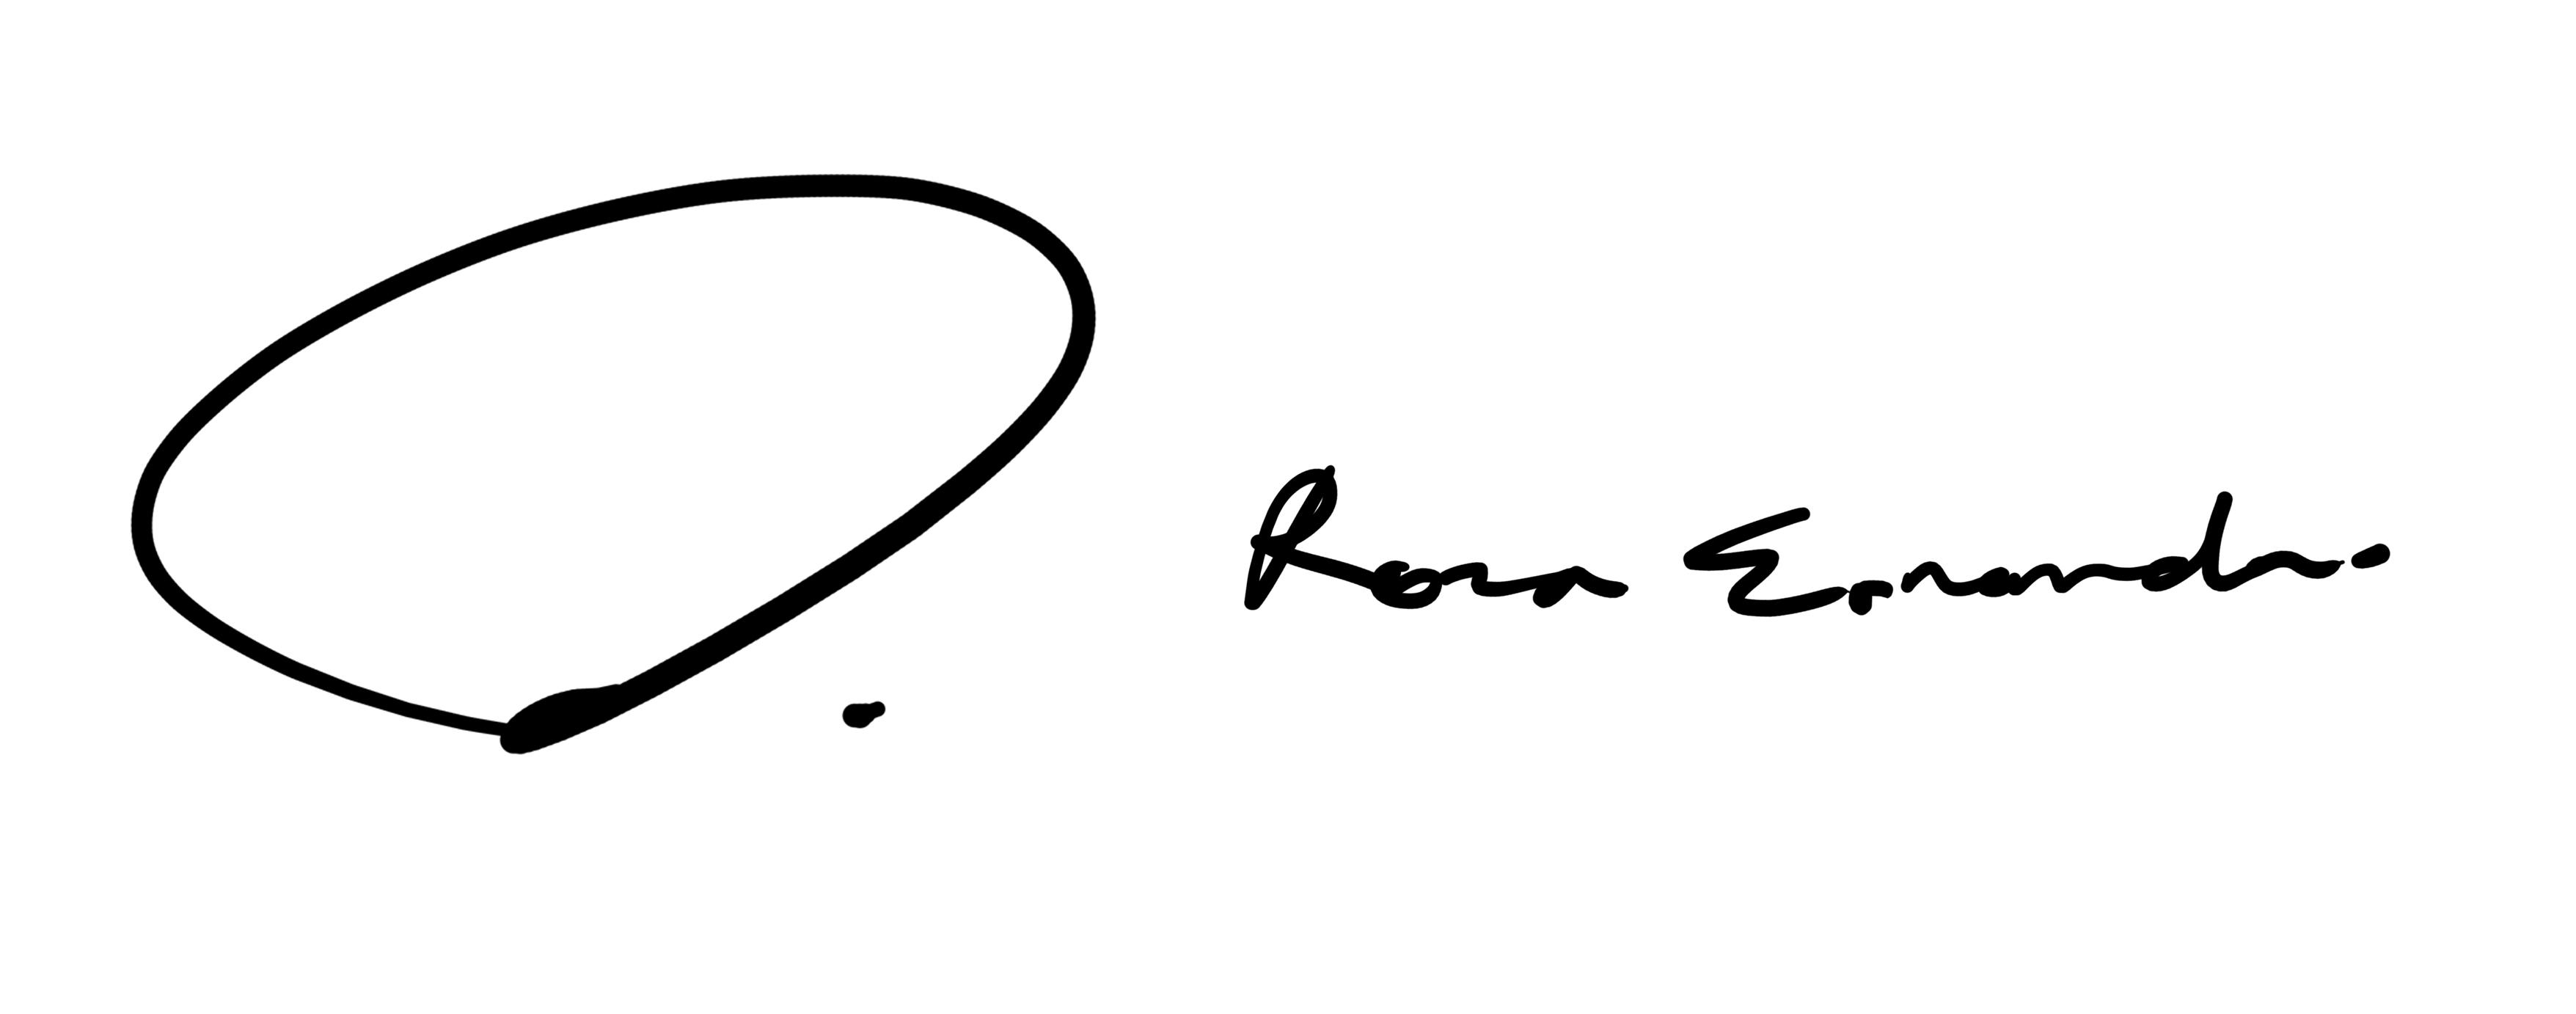 reza ernanda's Signature